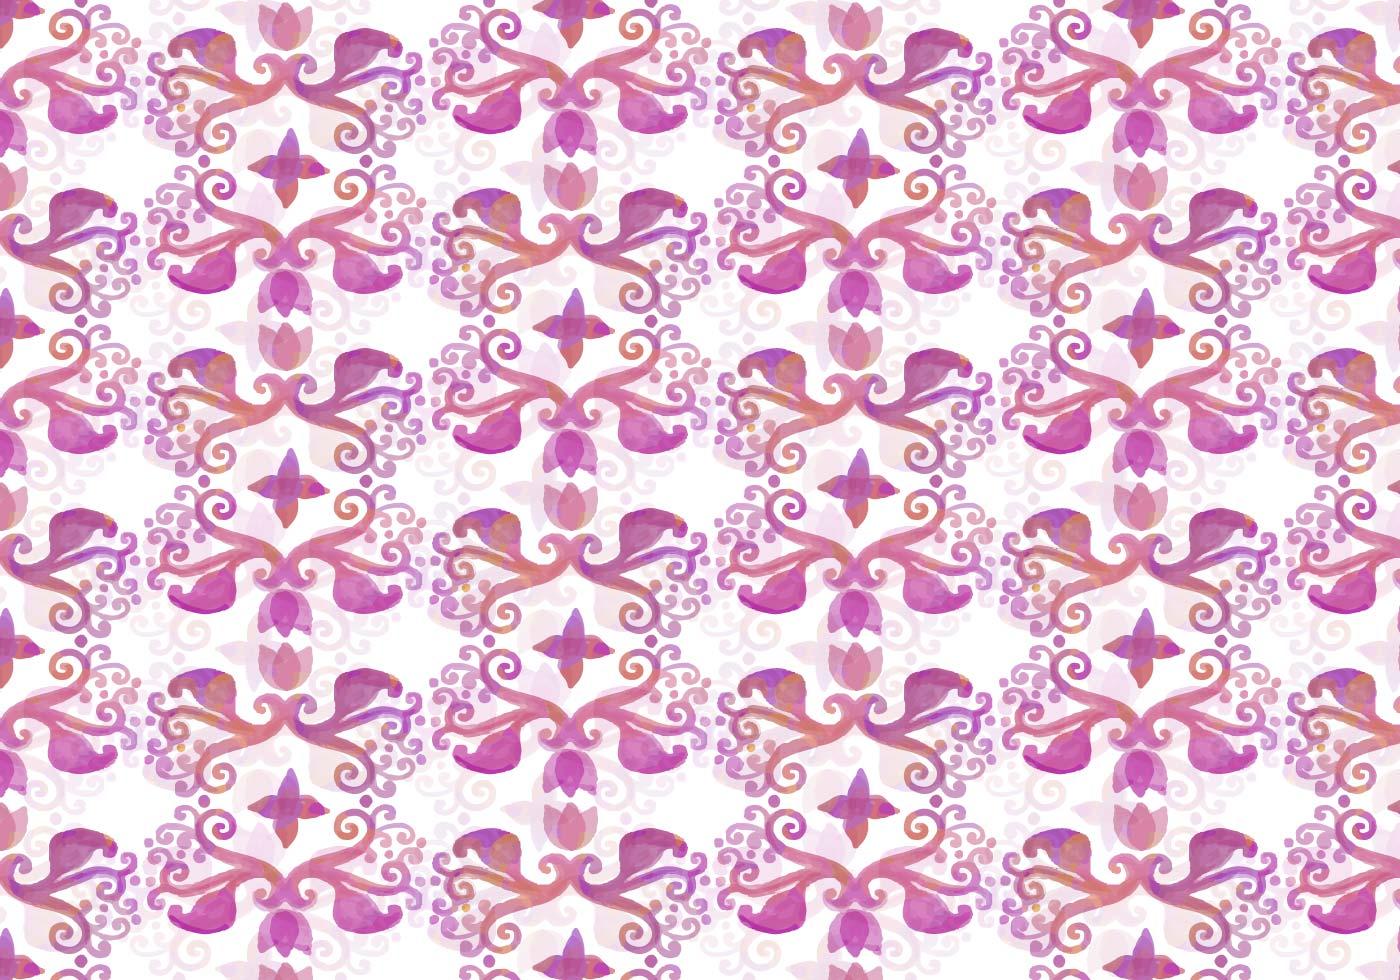 royal pink background - photo #10